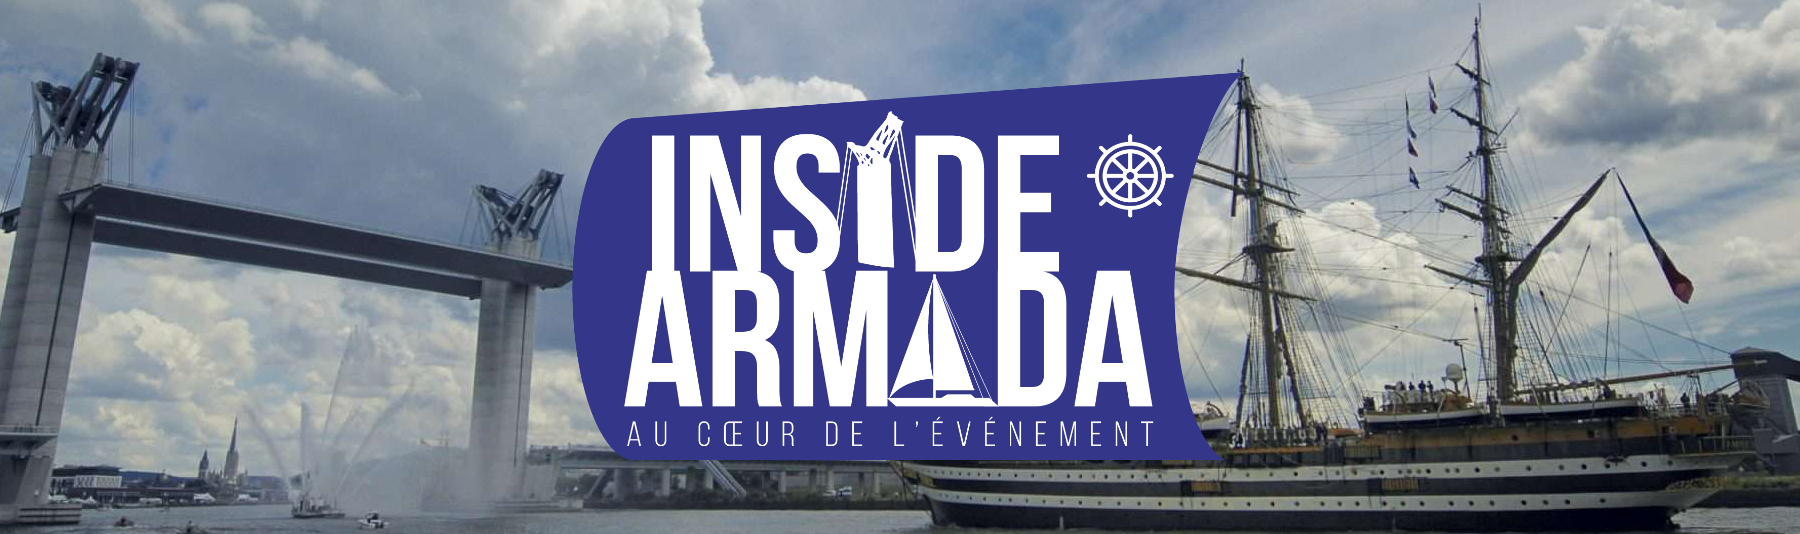 Inside Armada